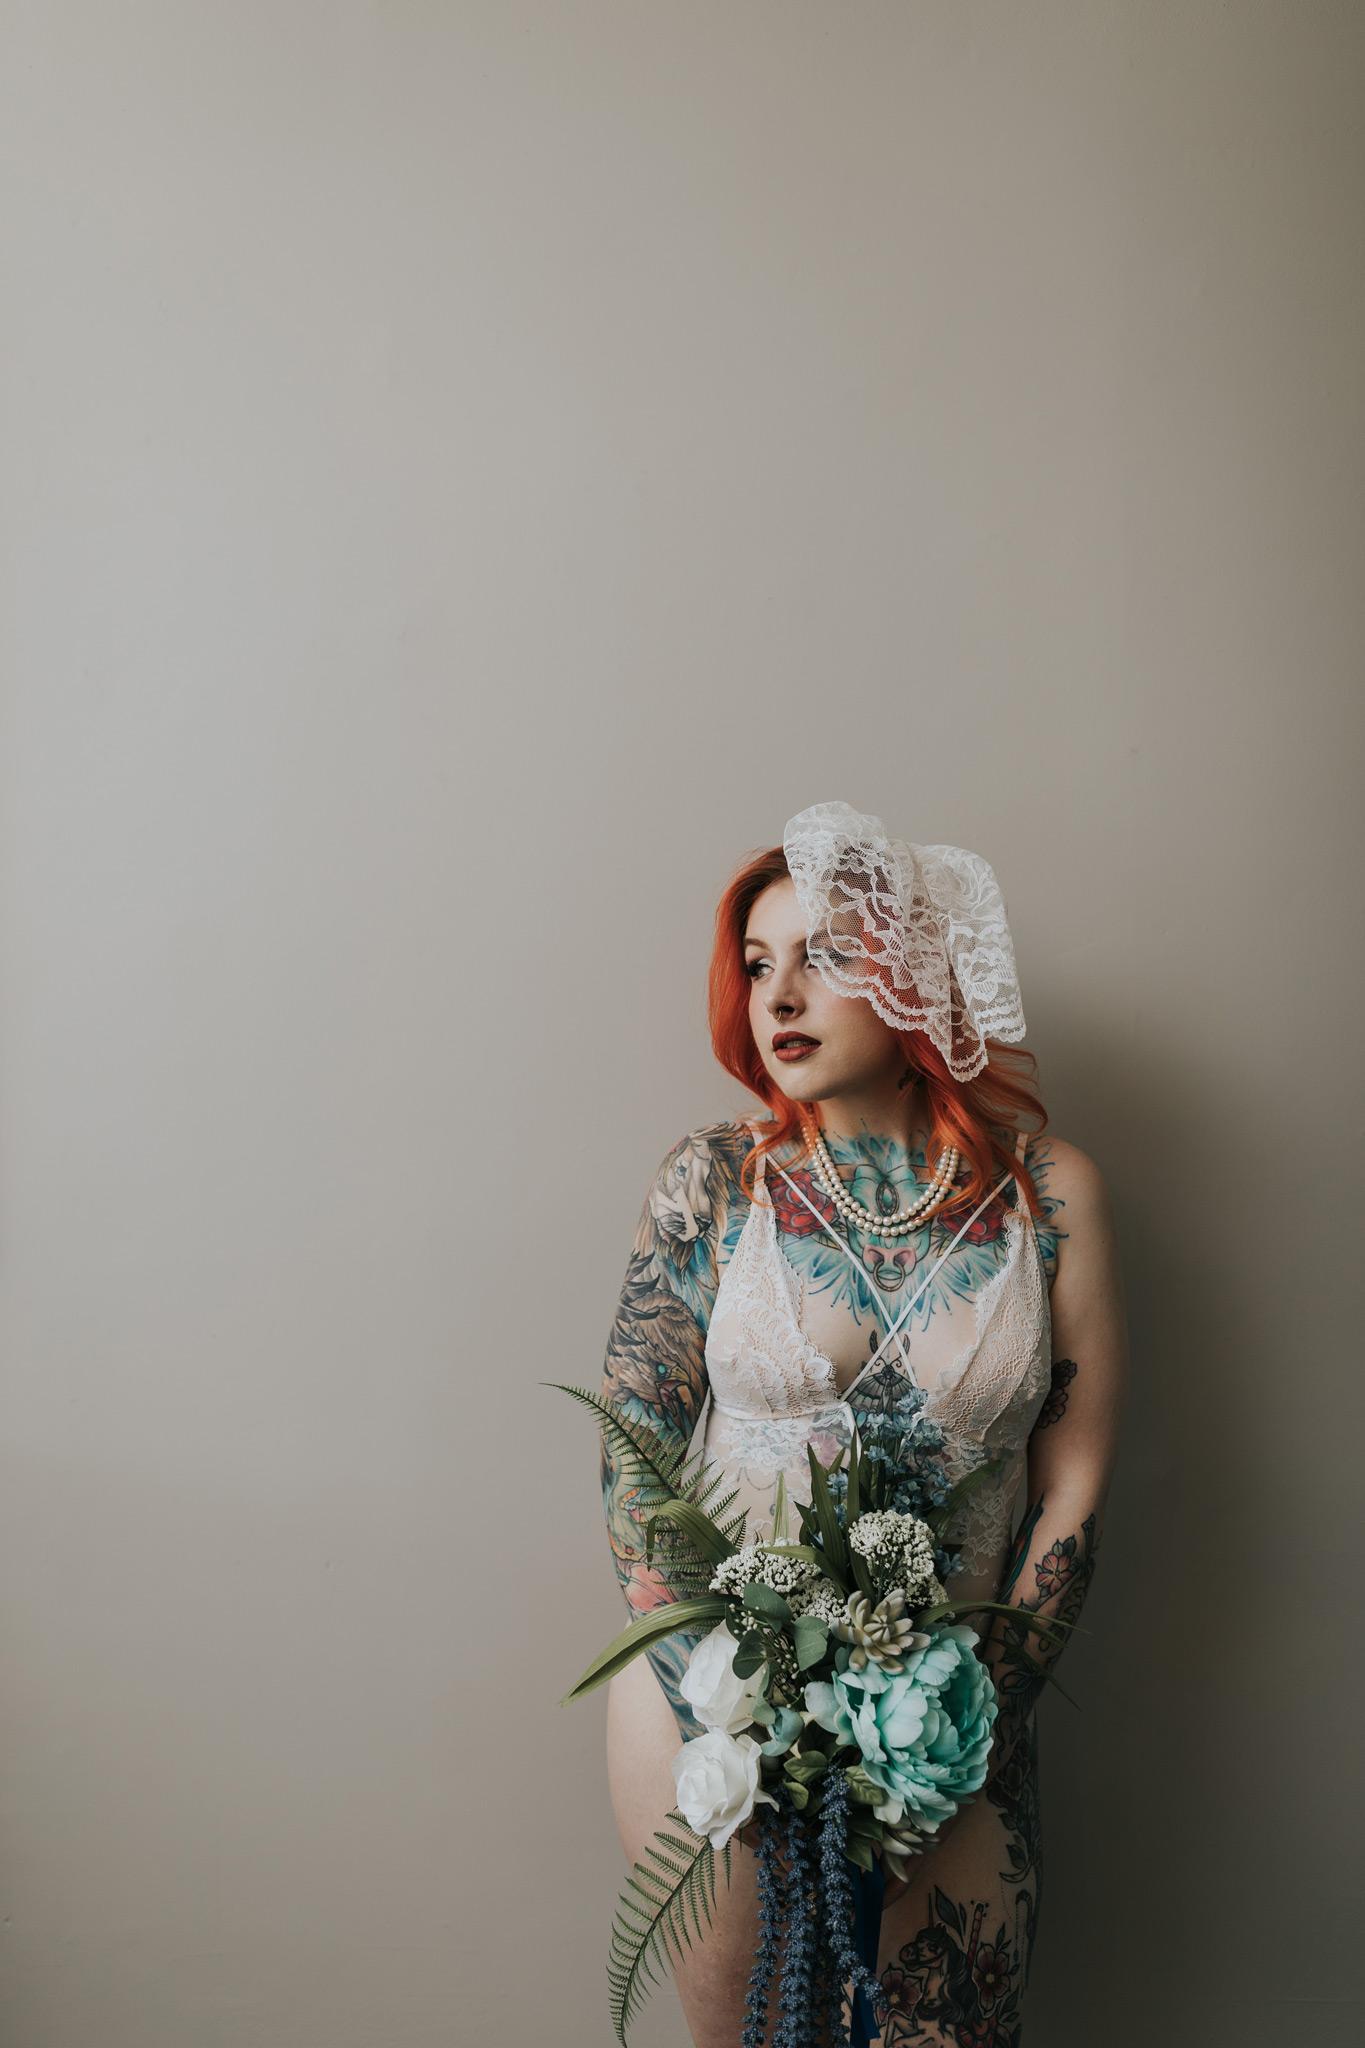 woman holding wedding bouquet birdcage veil bridal boudoir